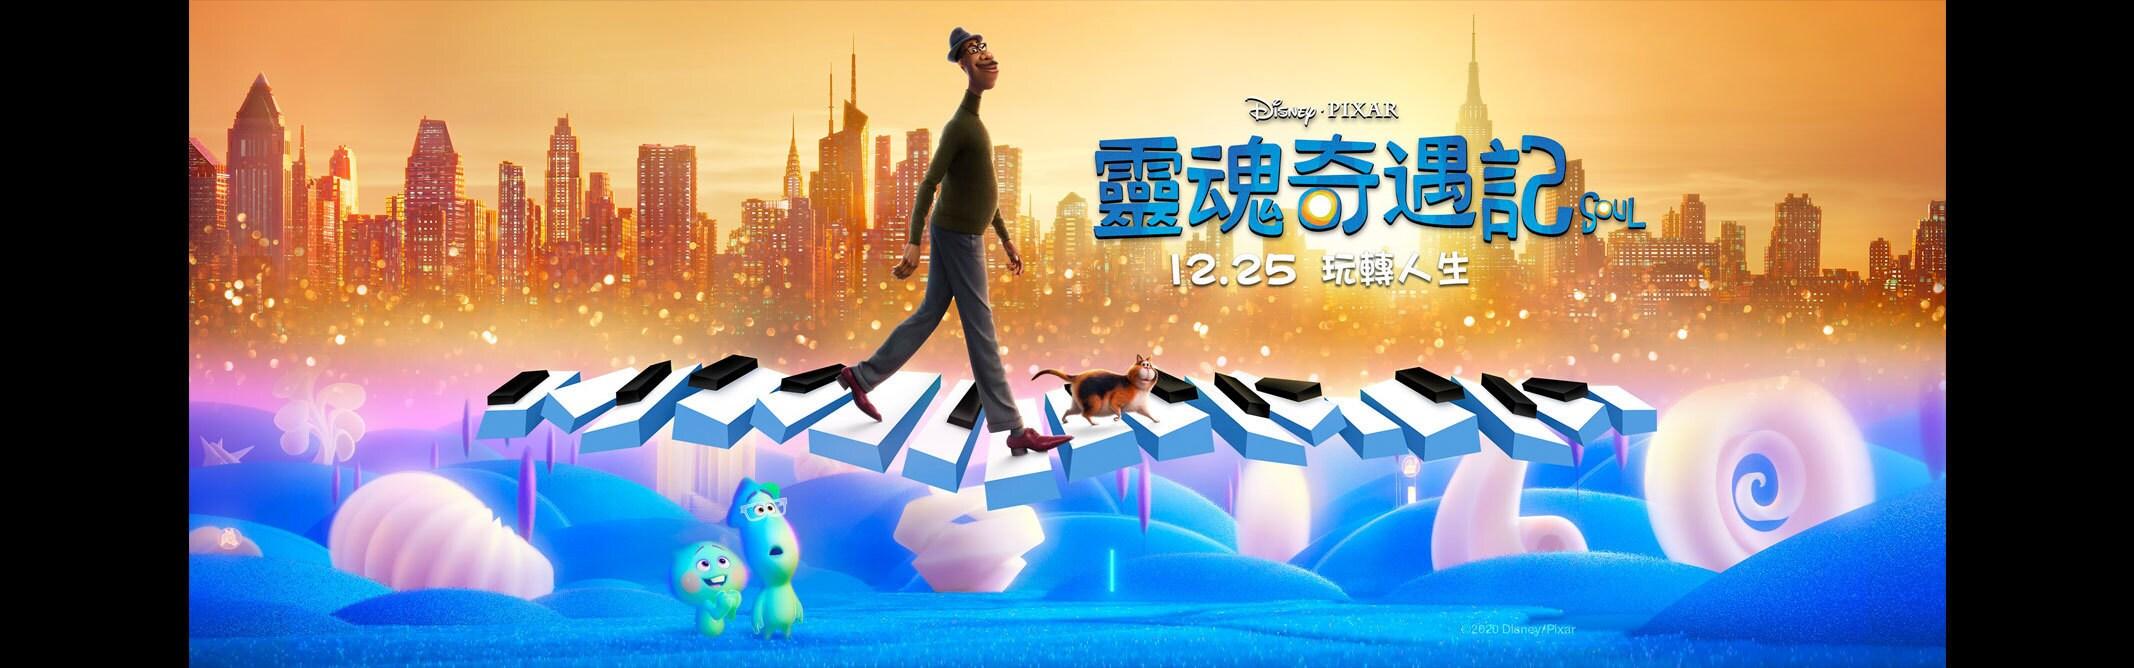 SOUL - Disney.com banner